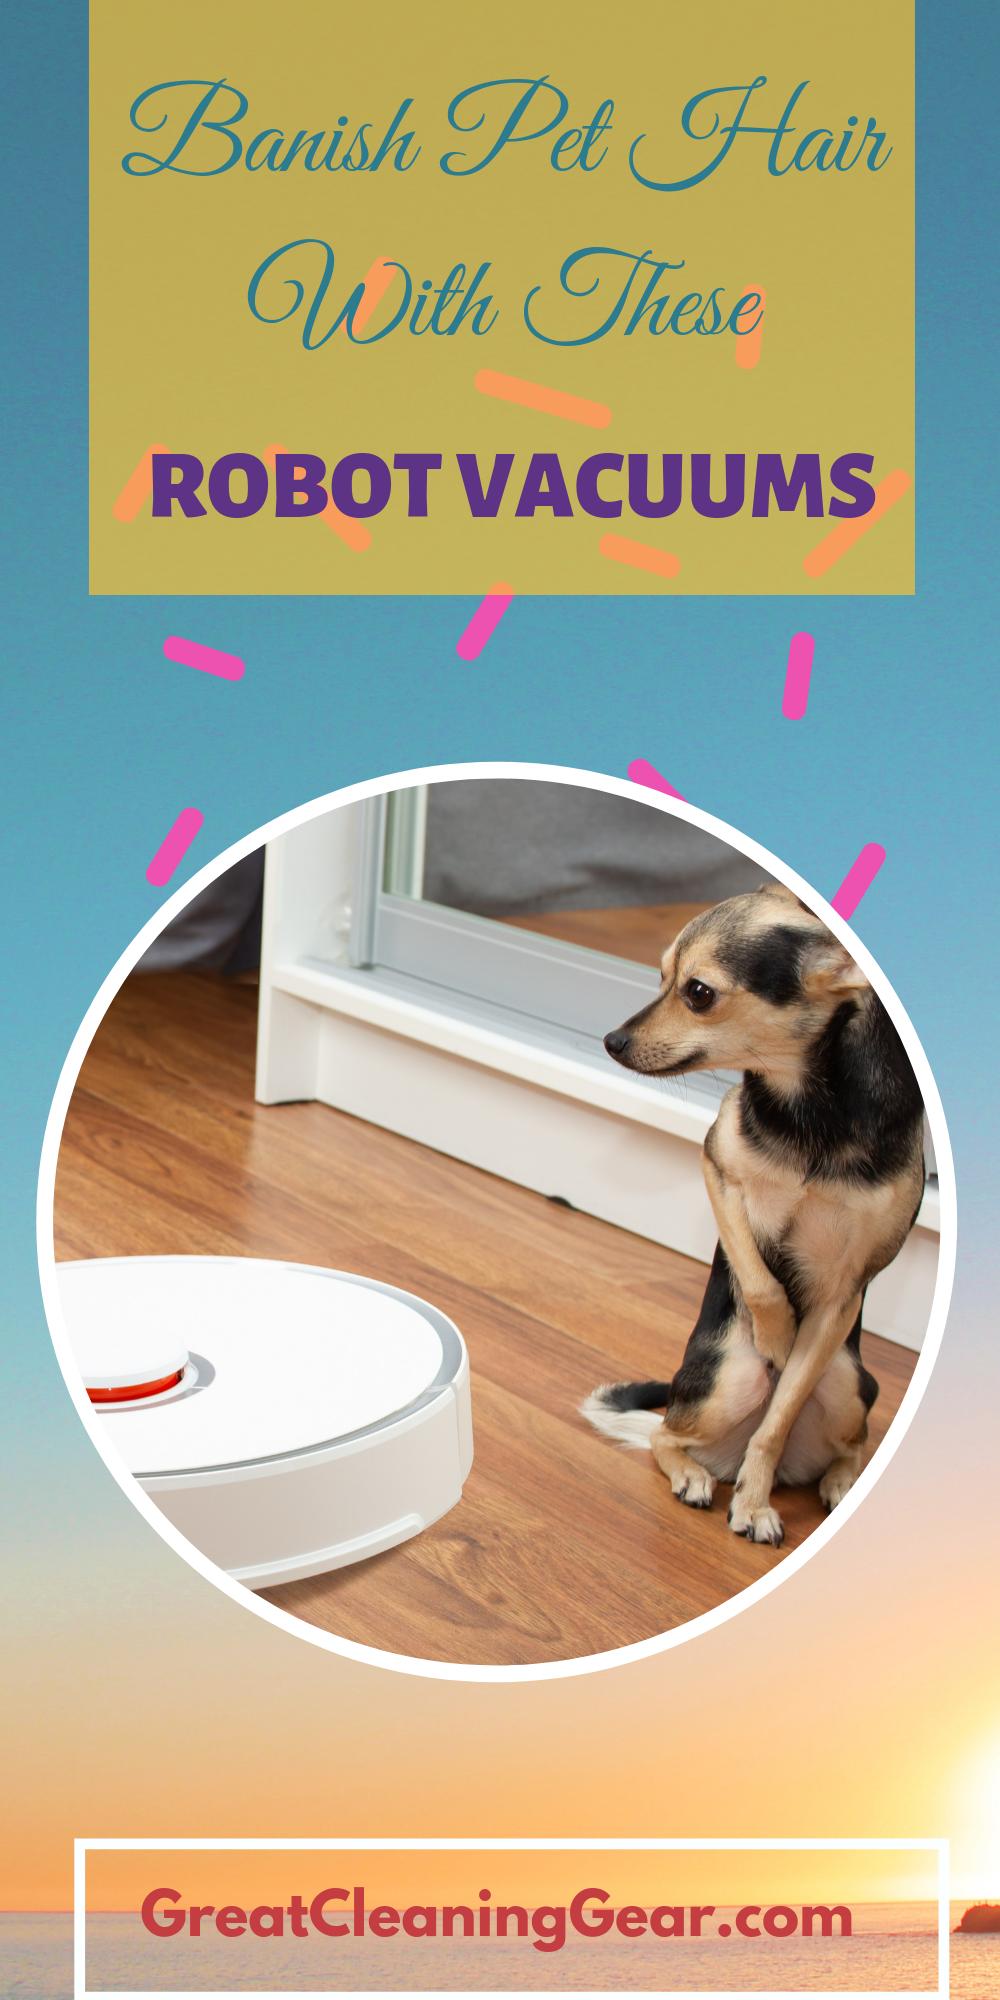 Best Robotic Vacuum For Dog Hair 2020 Great Cleaning Gear Robot Vacuum Dog Hair Robot Vacuum Reviews